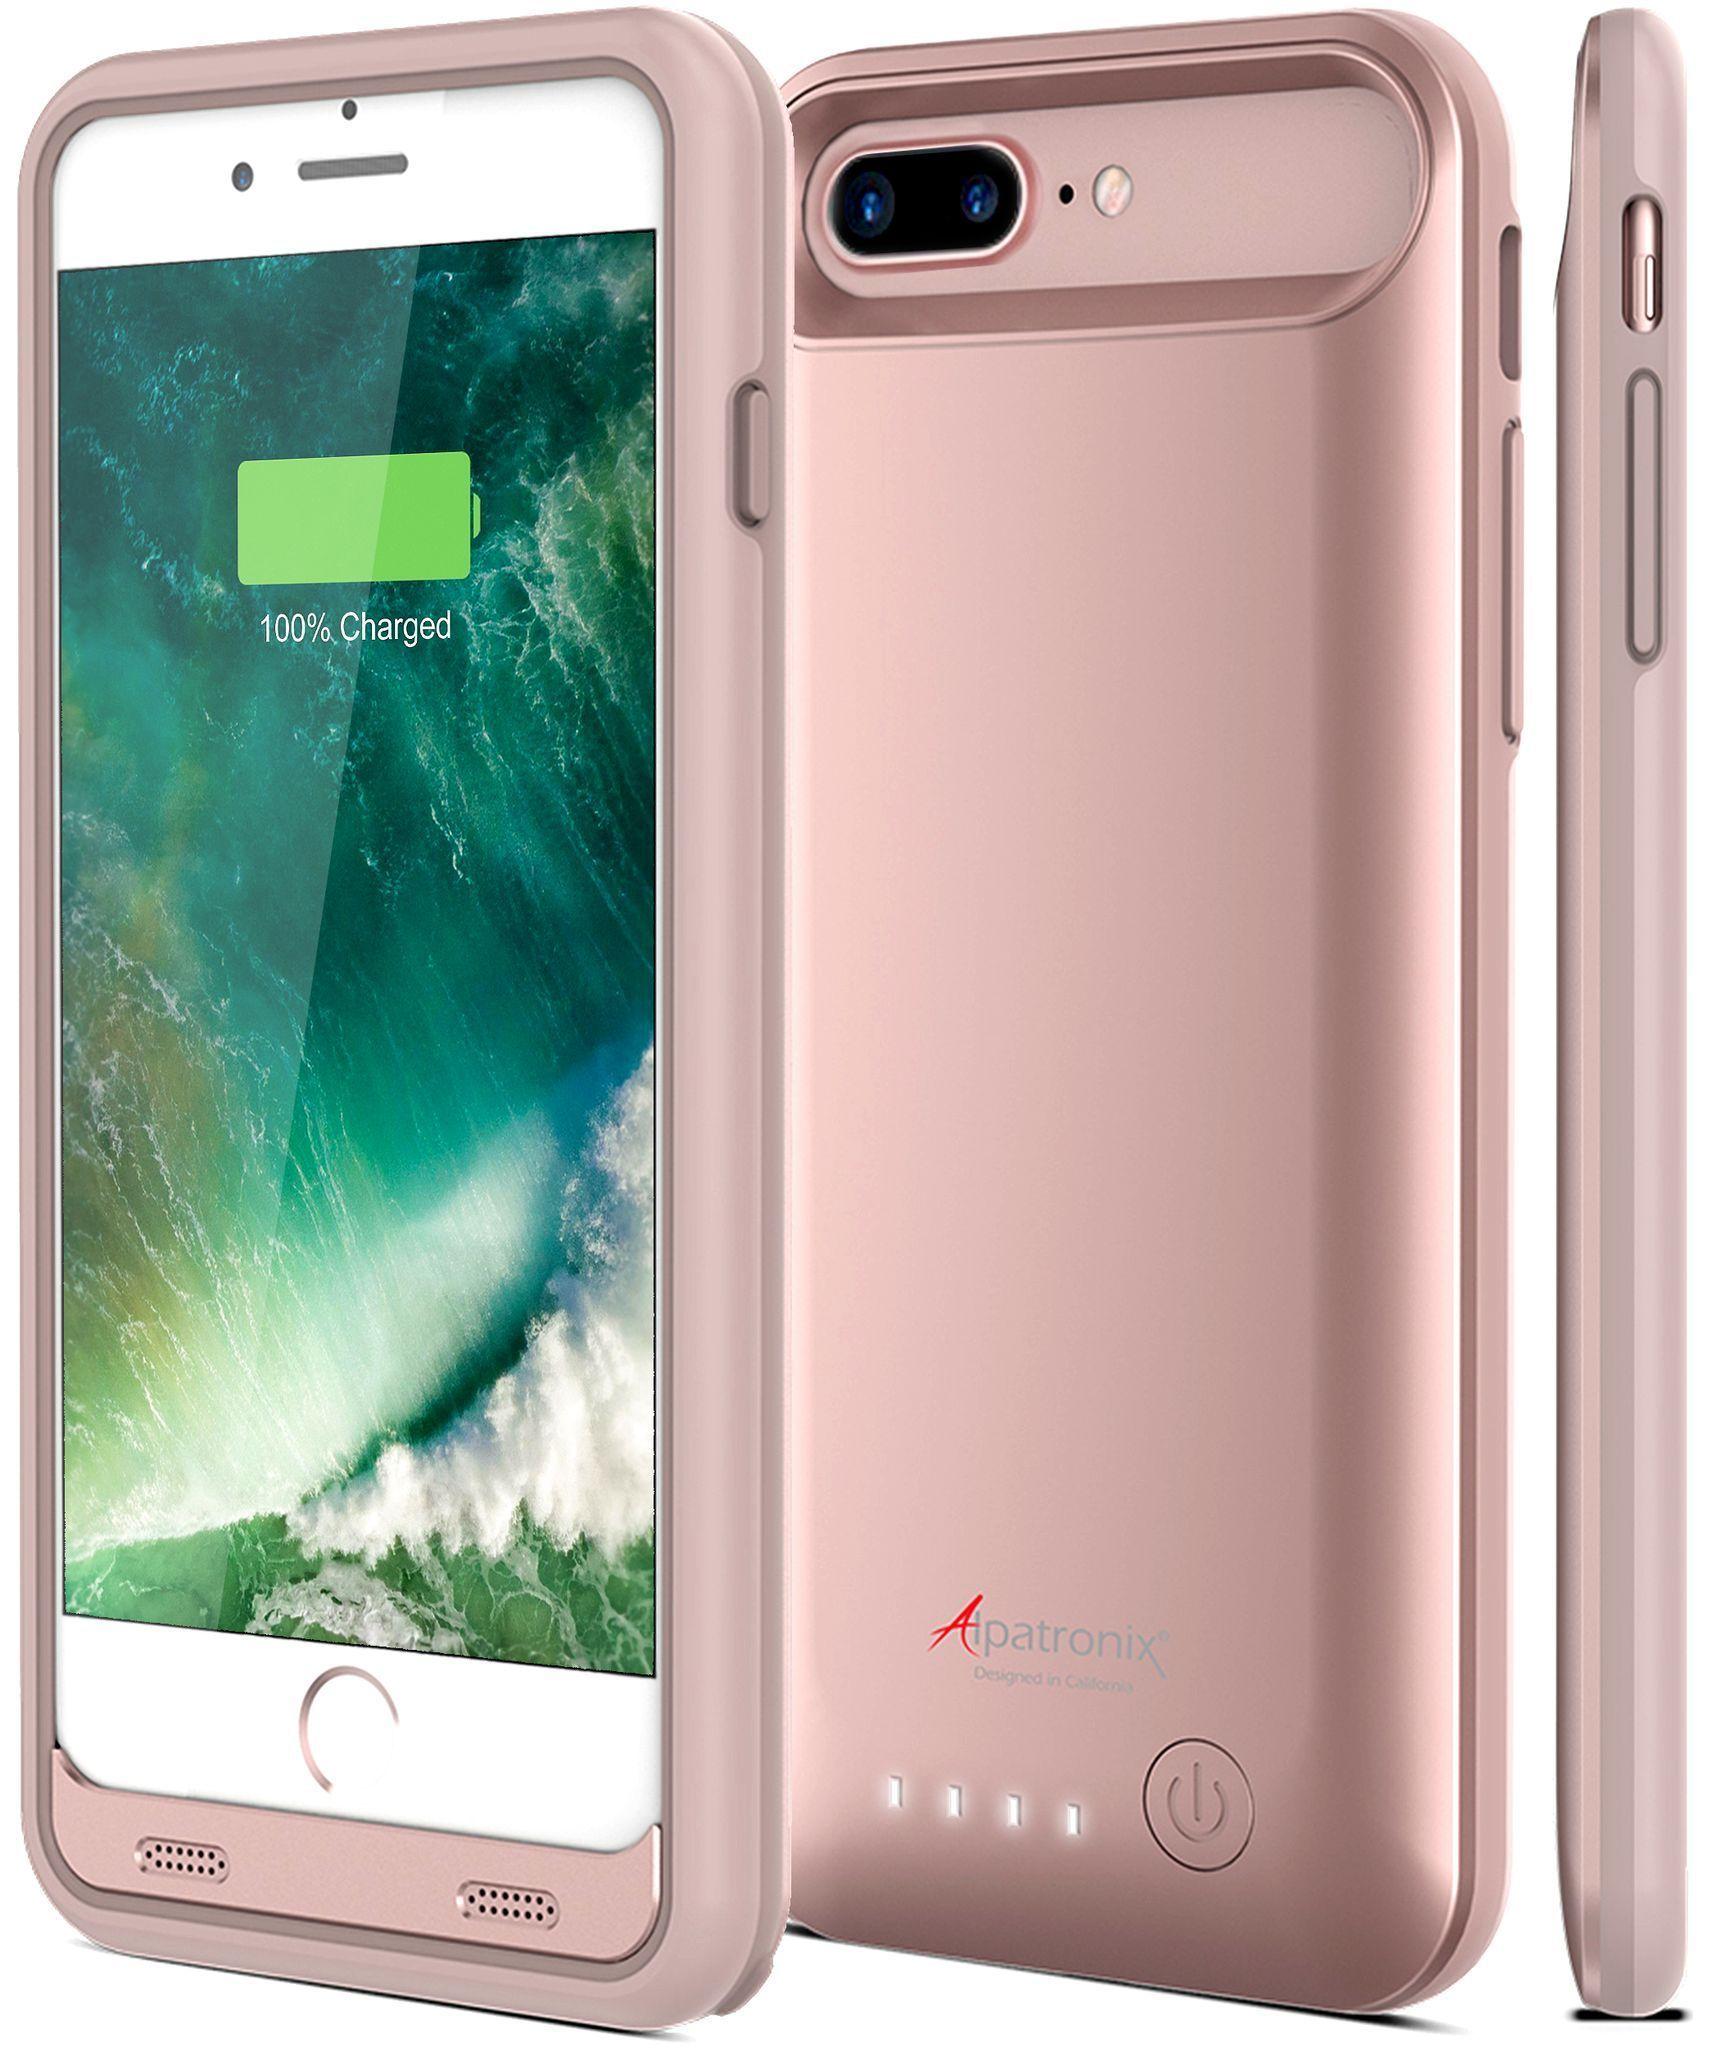 Alpatronix Bx170plus 4000mah Apple Certified Chip Iphone 7 Plus Battery Charging Case Iphone10 Iphone7p Iphone Phone Cases Iphone Cases Iphone Accessories